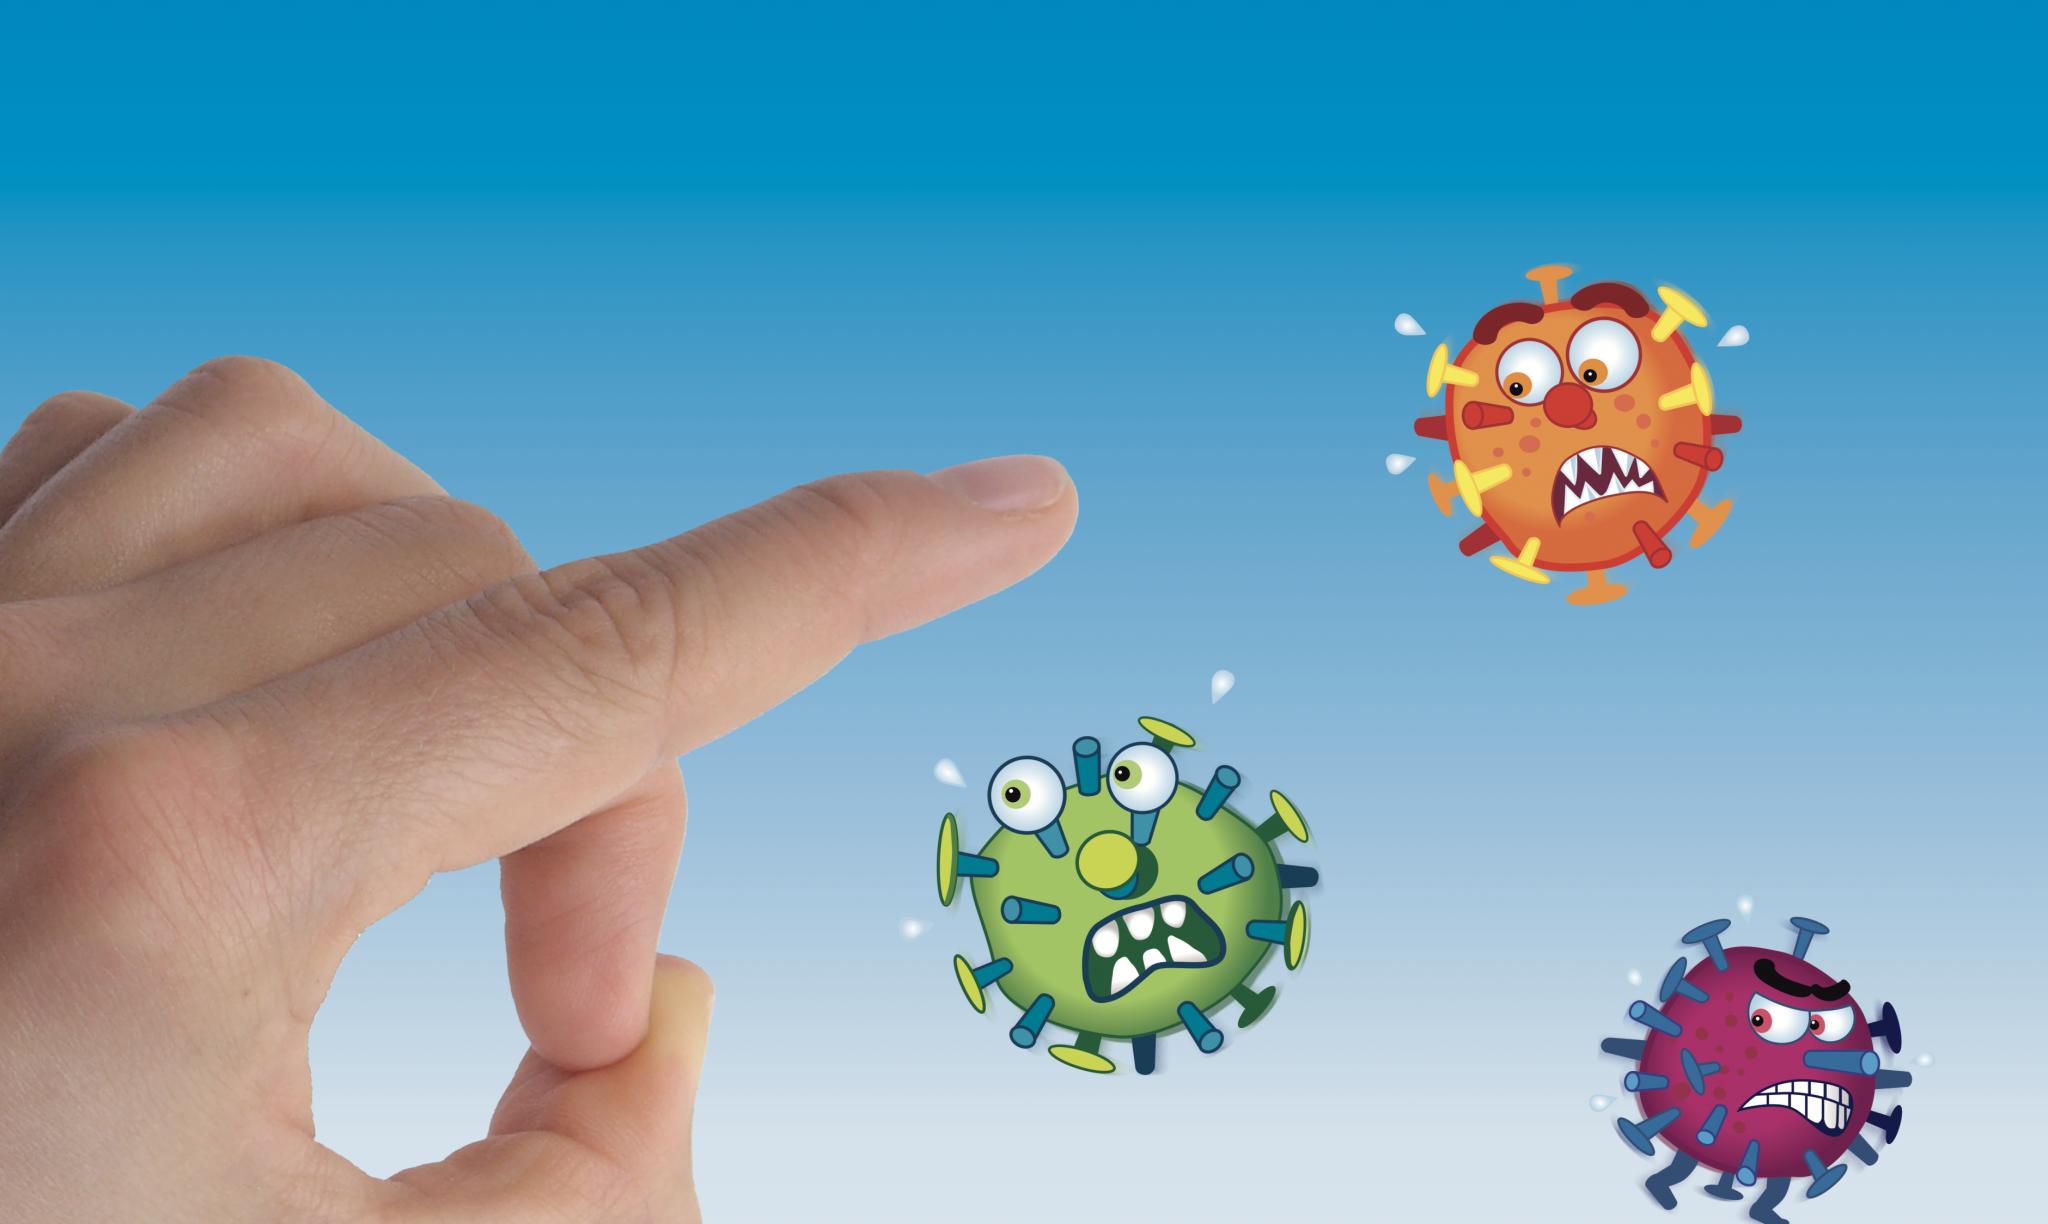 Plakat Grippeschutzimpfung KV Bund